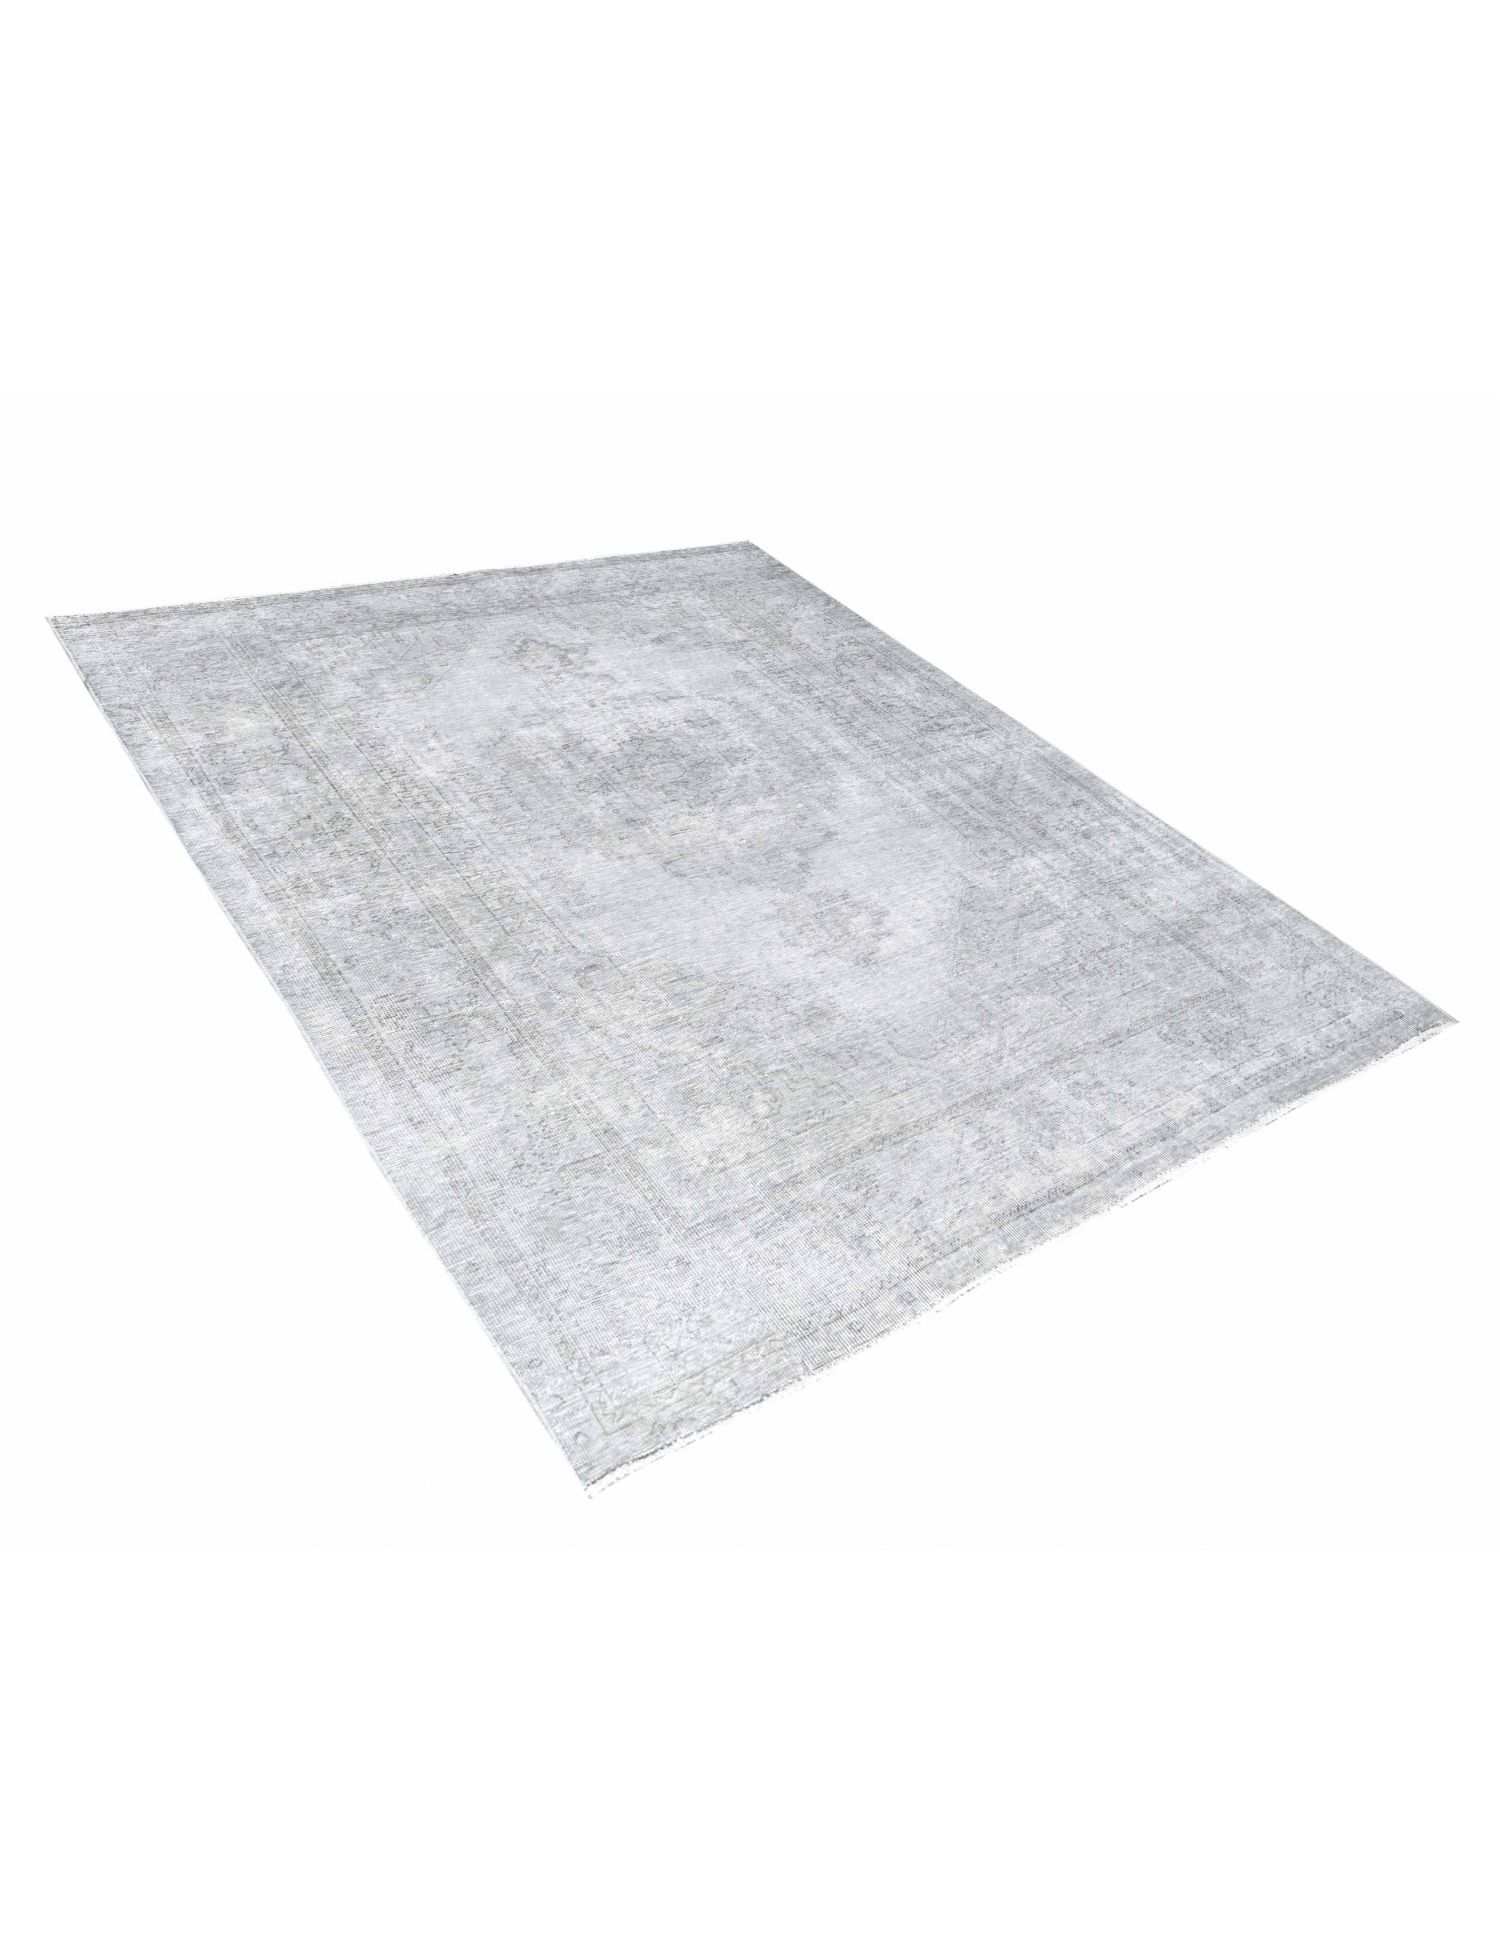 Vintage Carpet  grey <br/>258 x 206 cm